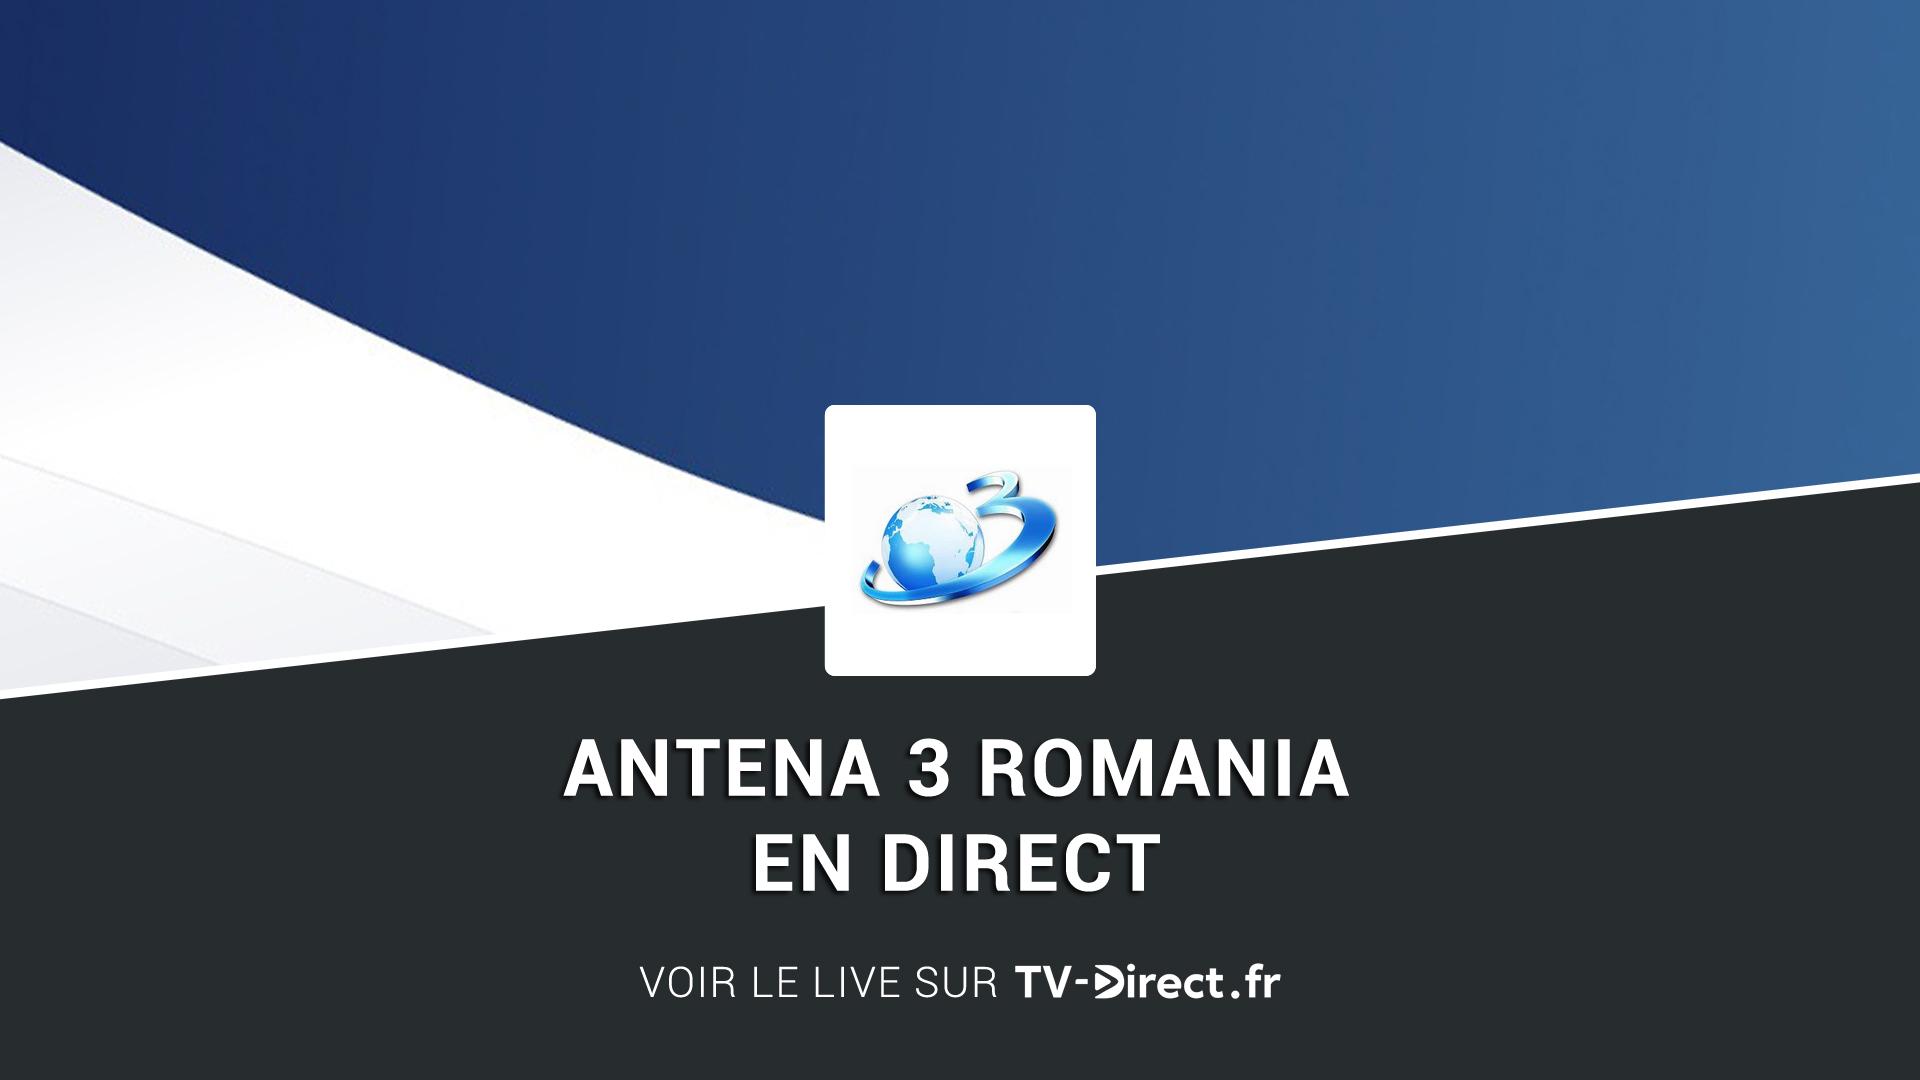 Antena 3 Romania Direct - Regarder Antena 3 Romania live sur internet